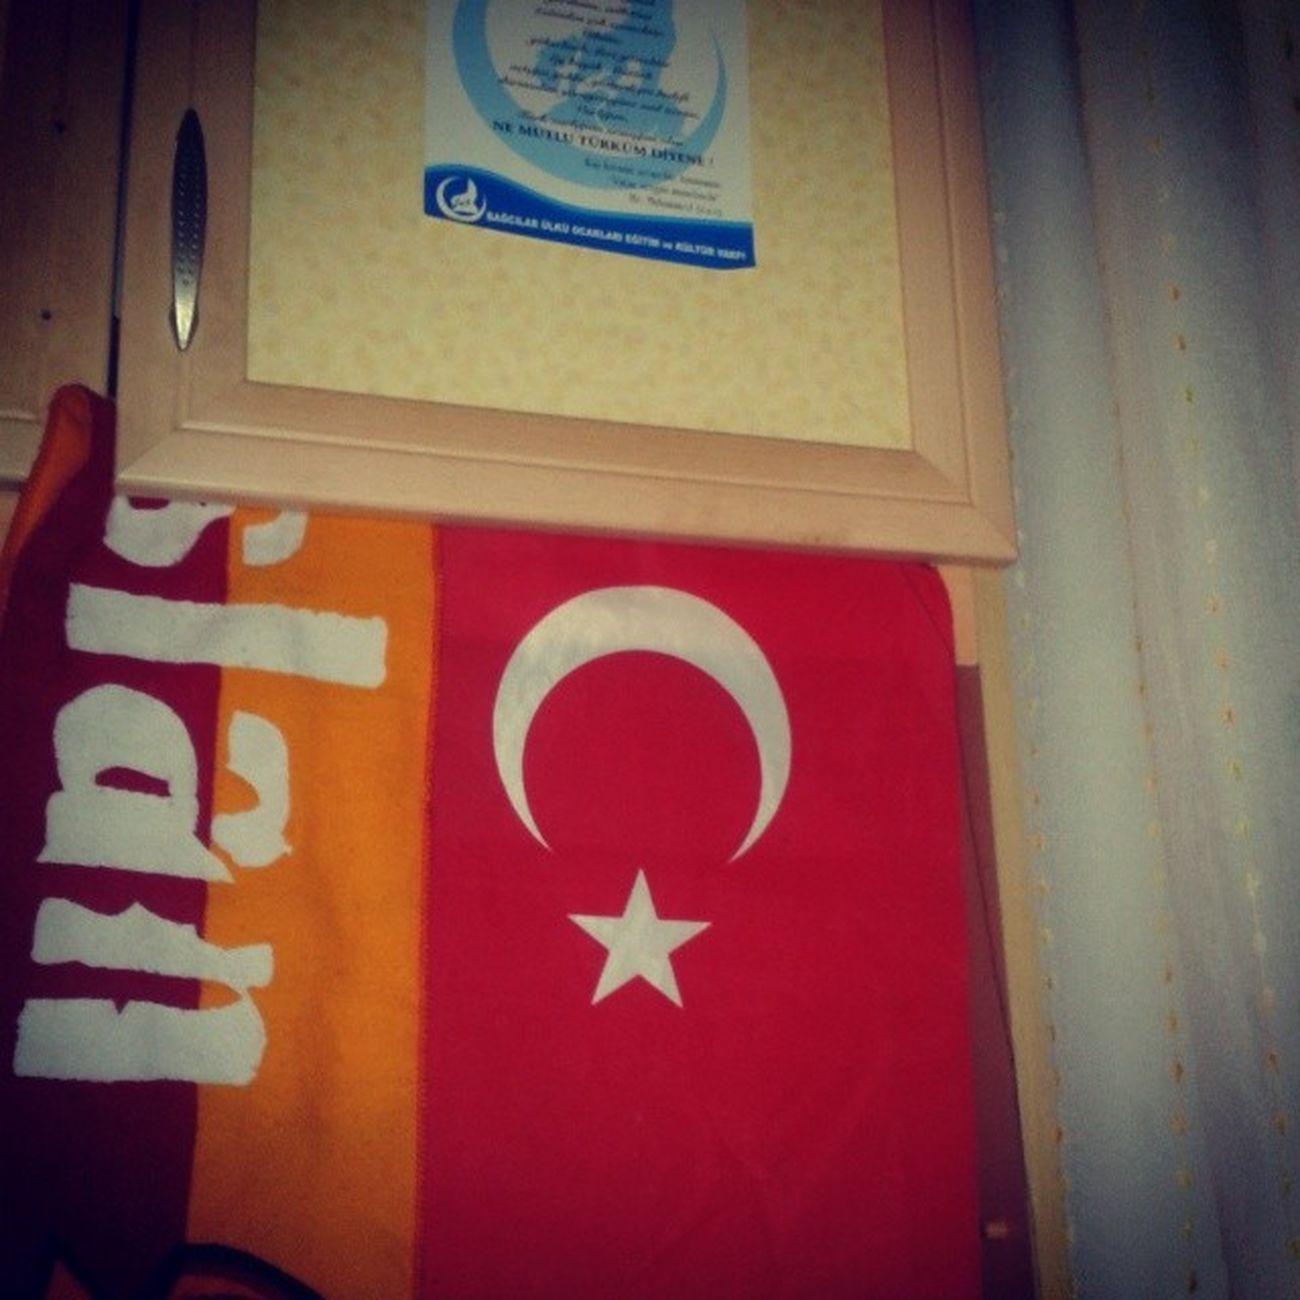 Sevdani al eline T ürk Ocakli Flag Love sevdamiz nationalist turan nogayel uA ua Ultraslan atki sarikirmizi